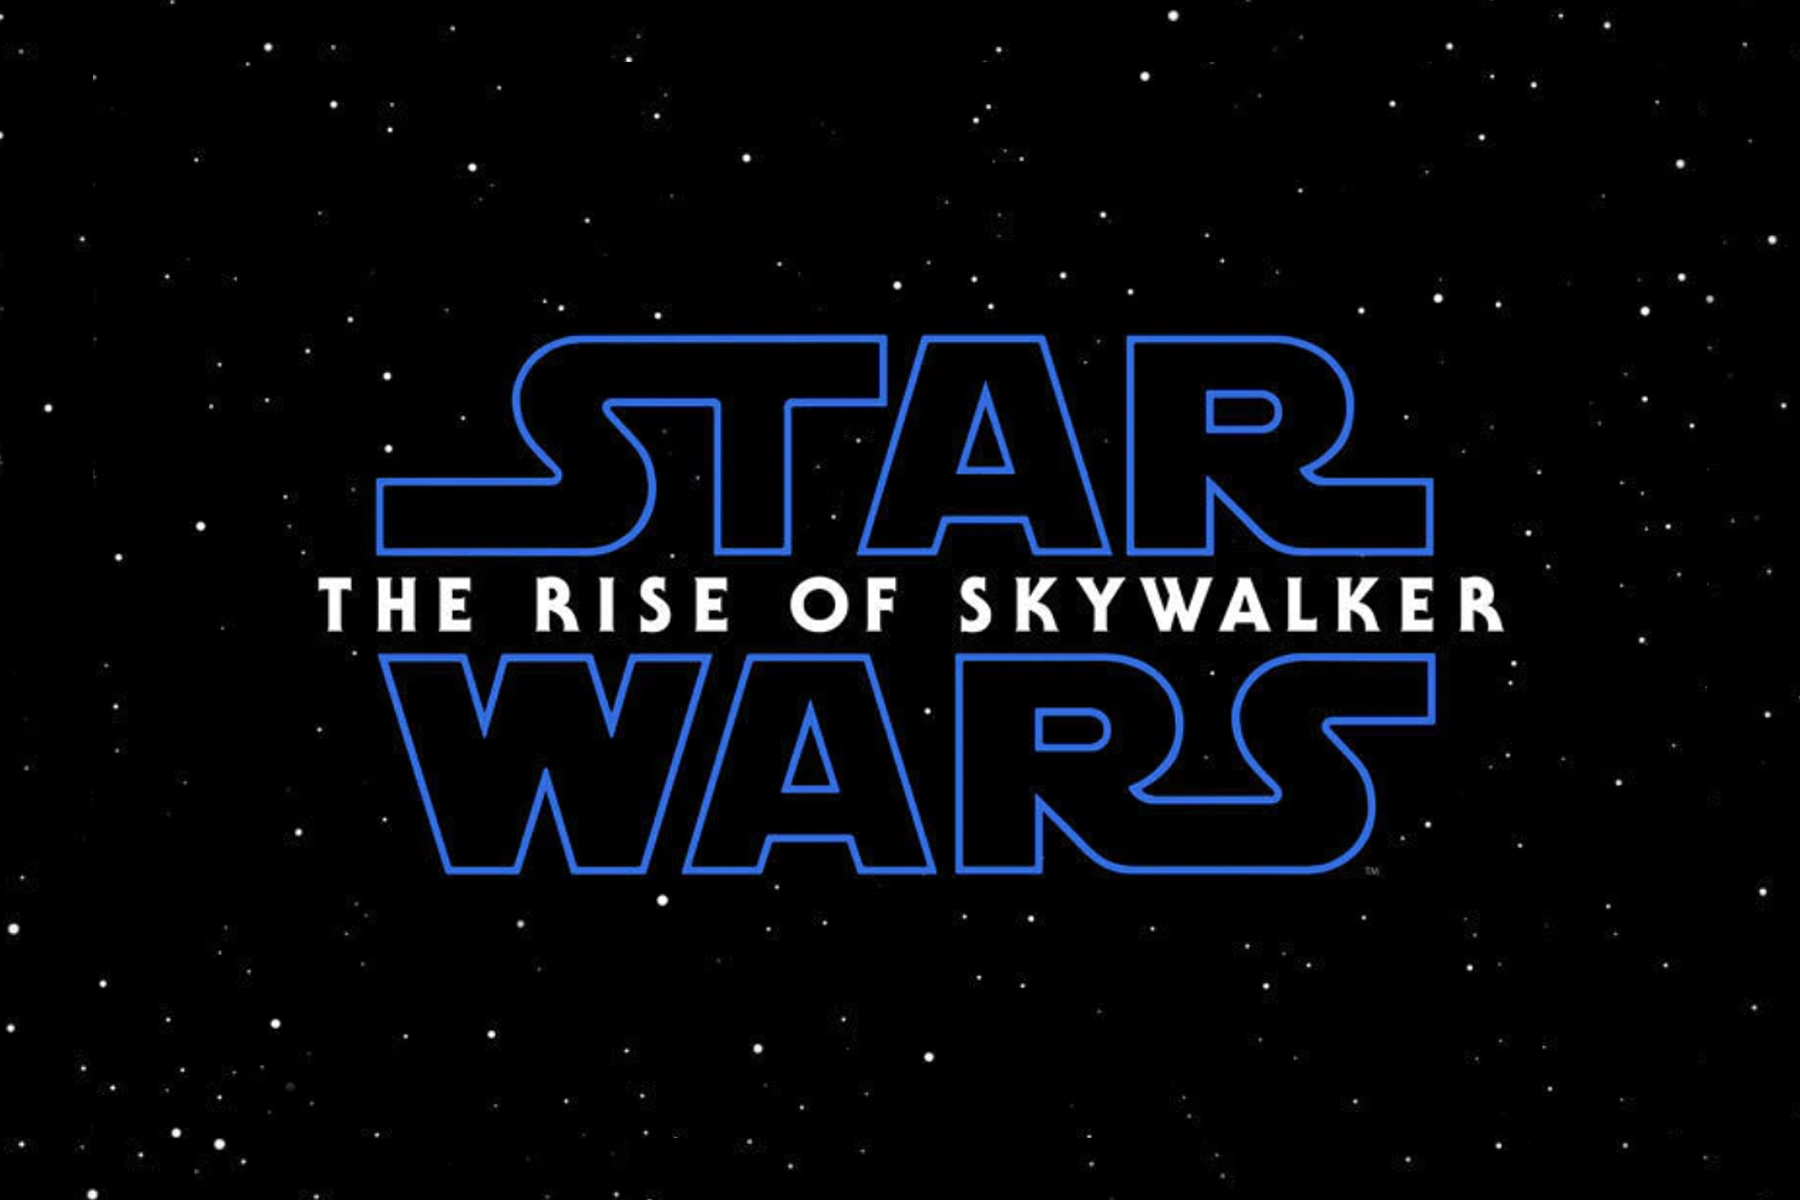 Star Wars - The Verge